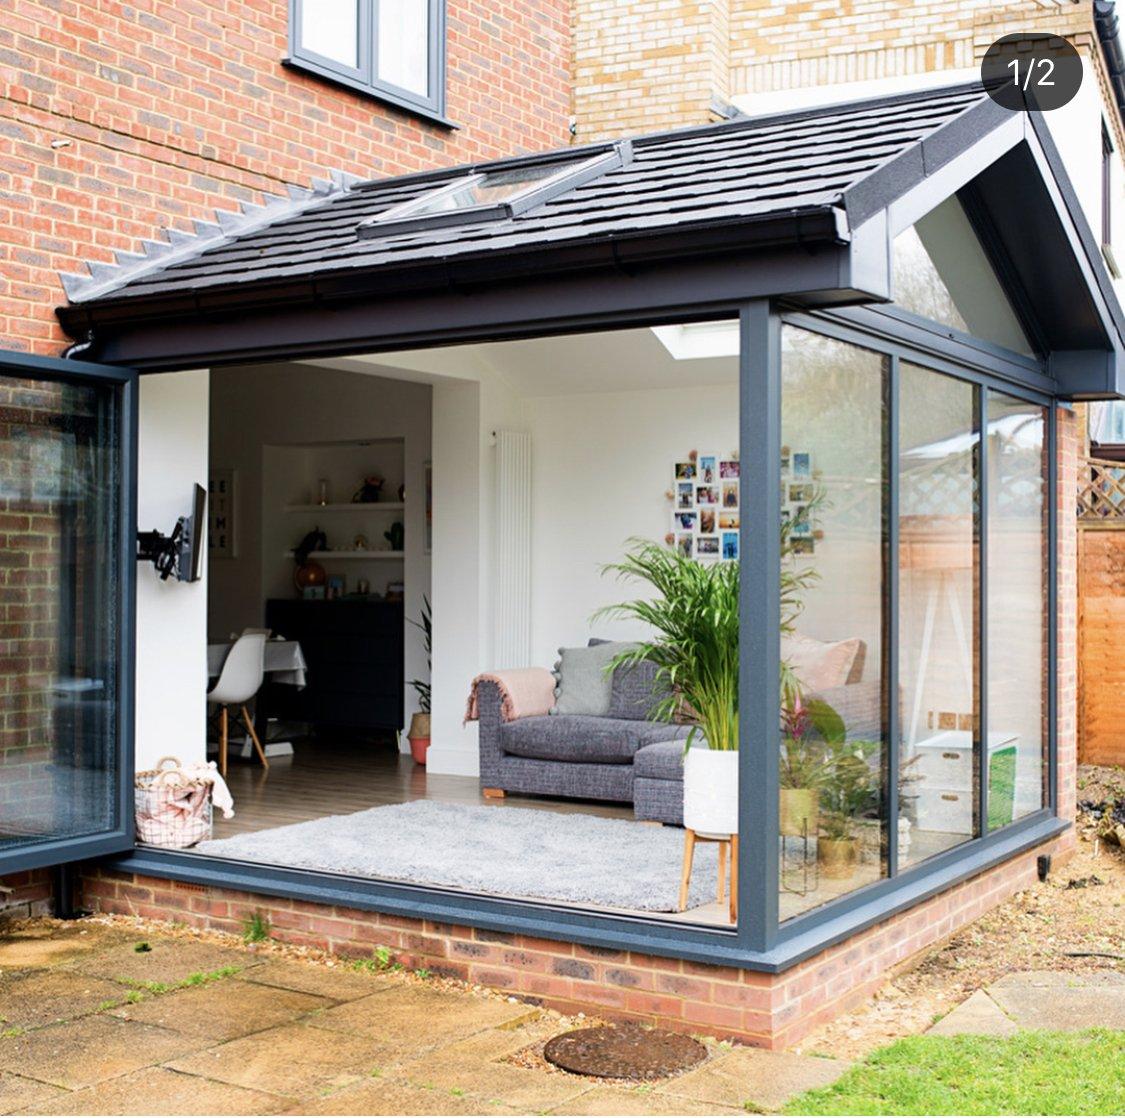 modern warm roof conservatory feedback please ...